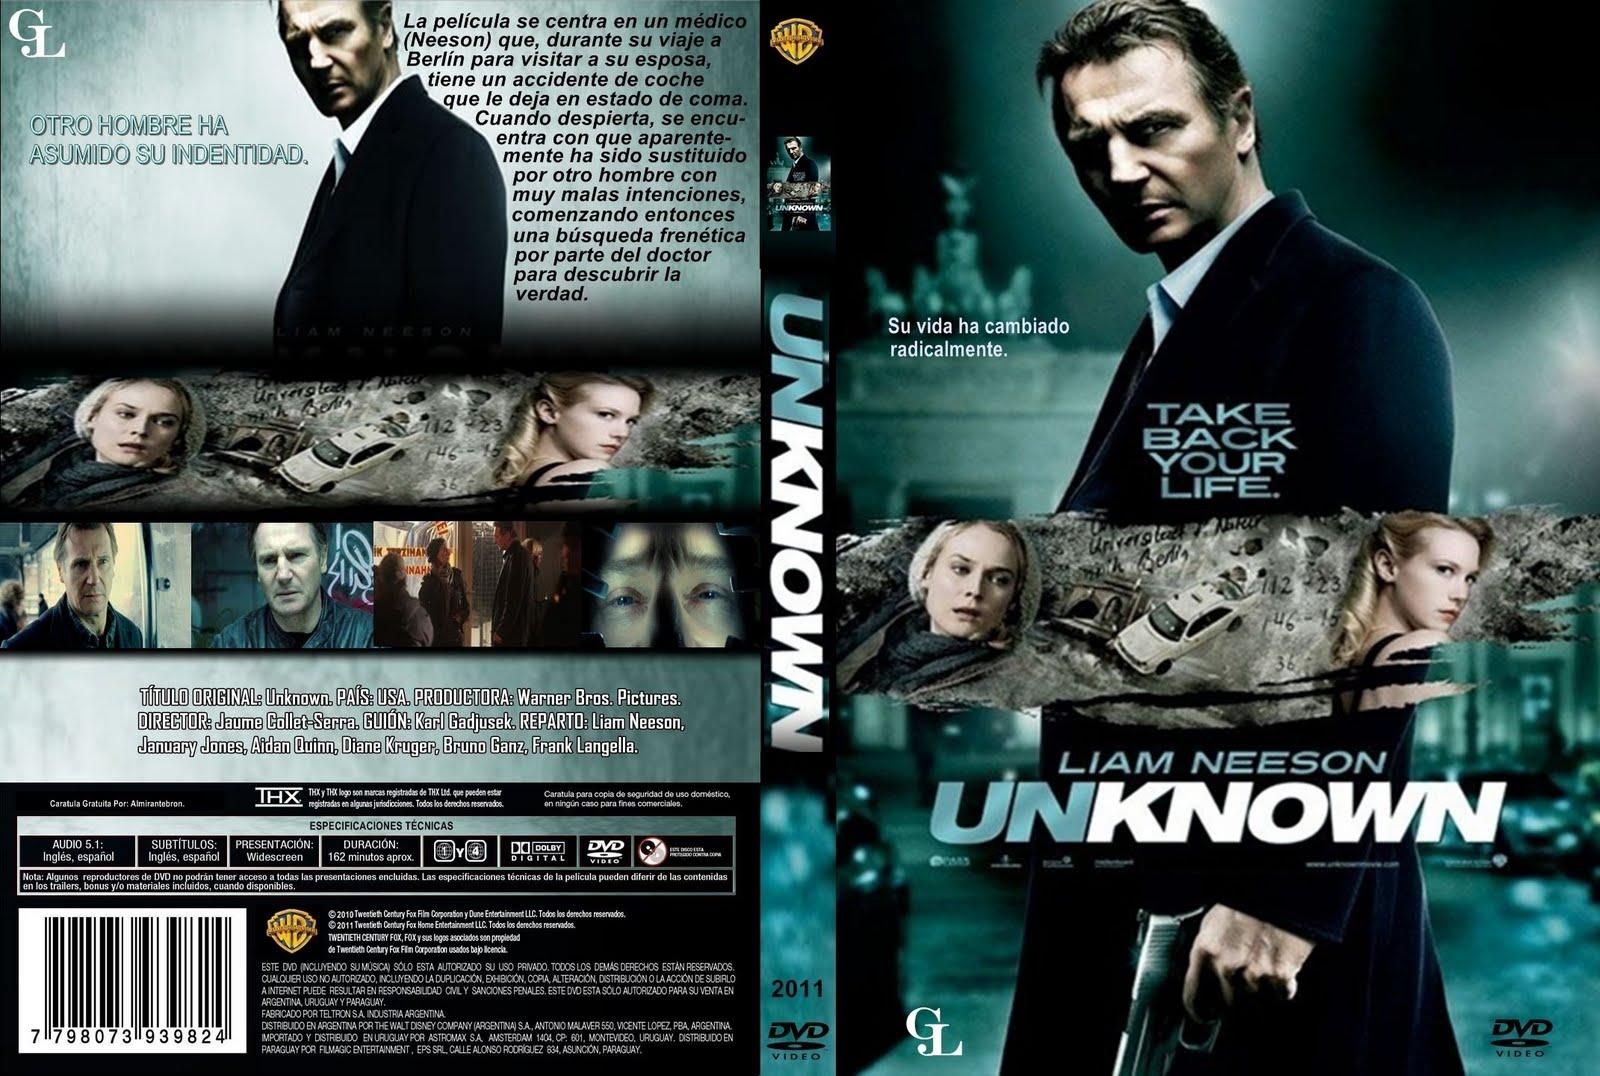 http://4.bp.blogspot.com/-CShtfcZODEM/TiTCoczhNrI/AAAAAAAAASs/M1kjbeWGvrg/s1600/Unknown+Custom+Por+Almirantebron+-+dvd.jpg